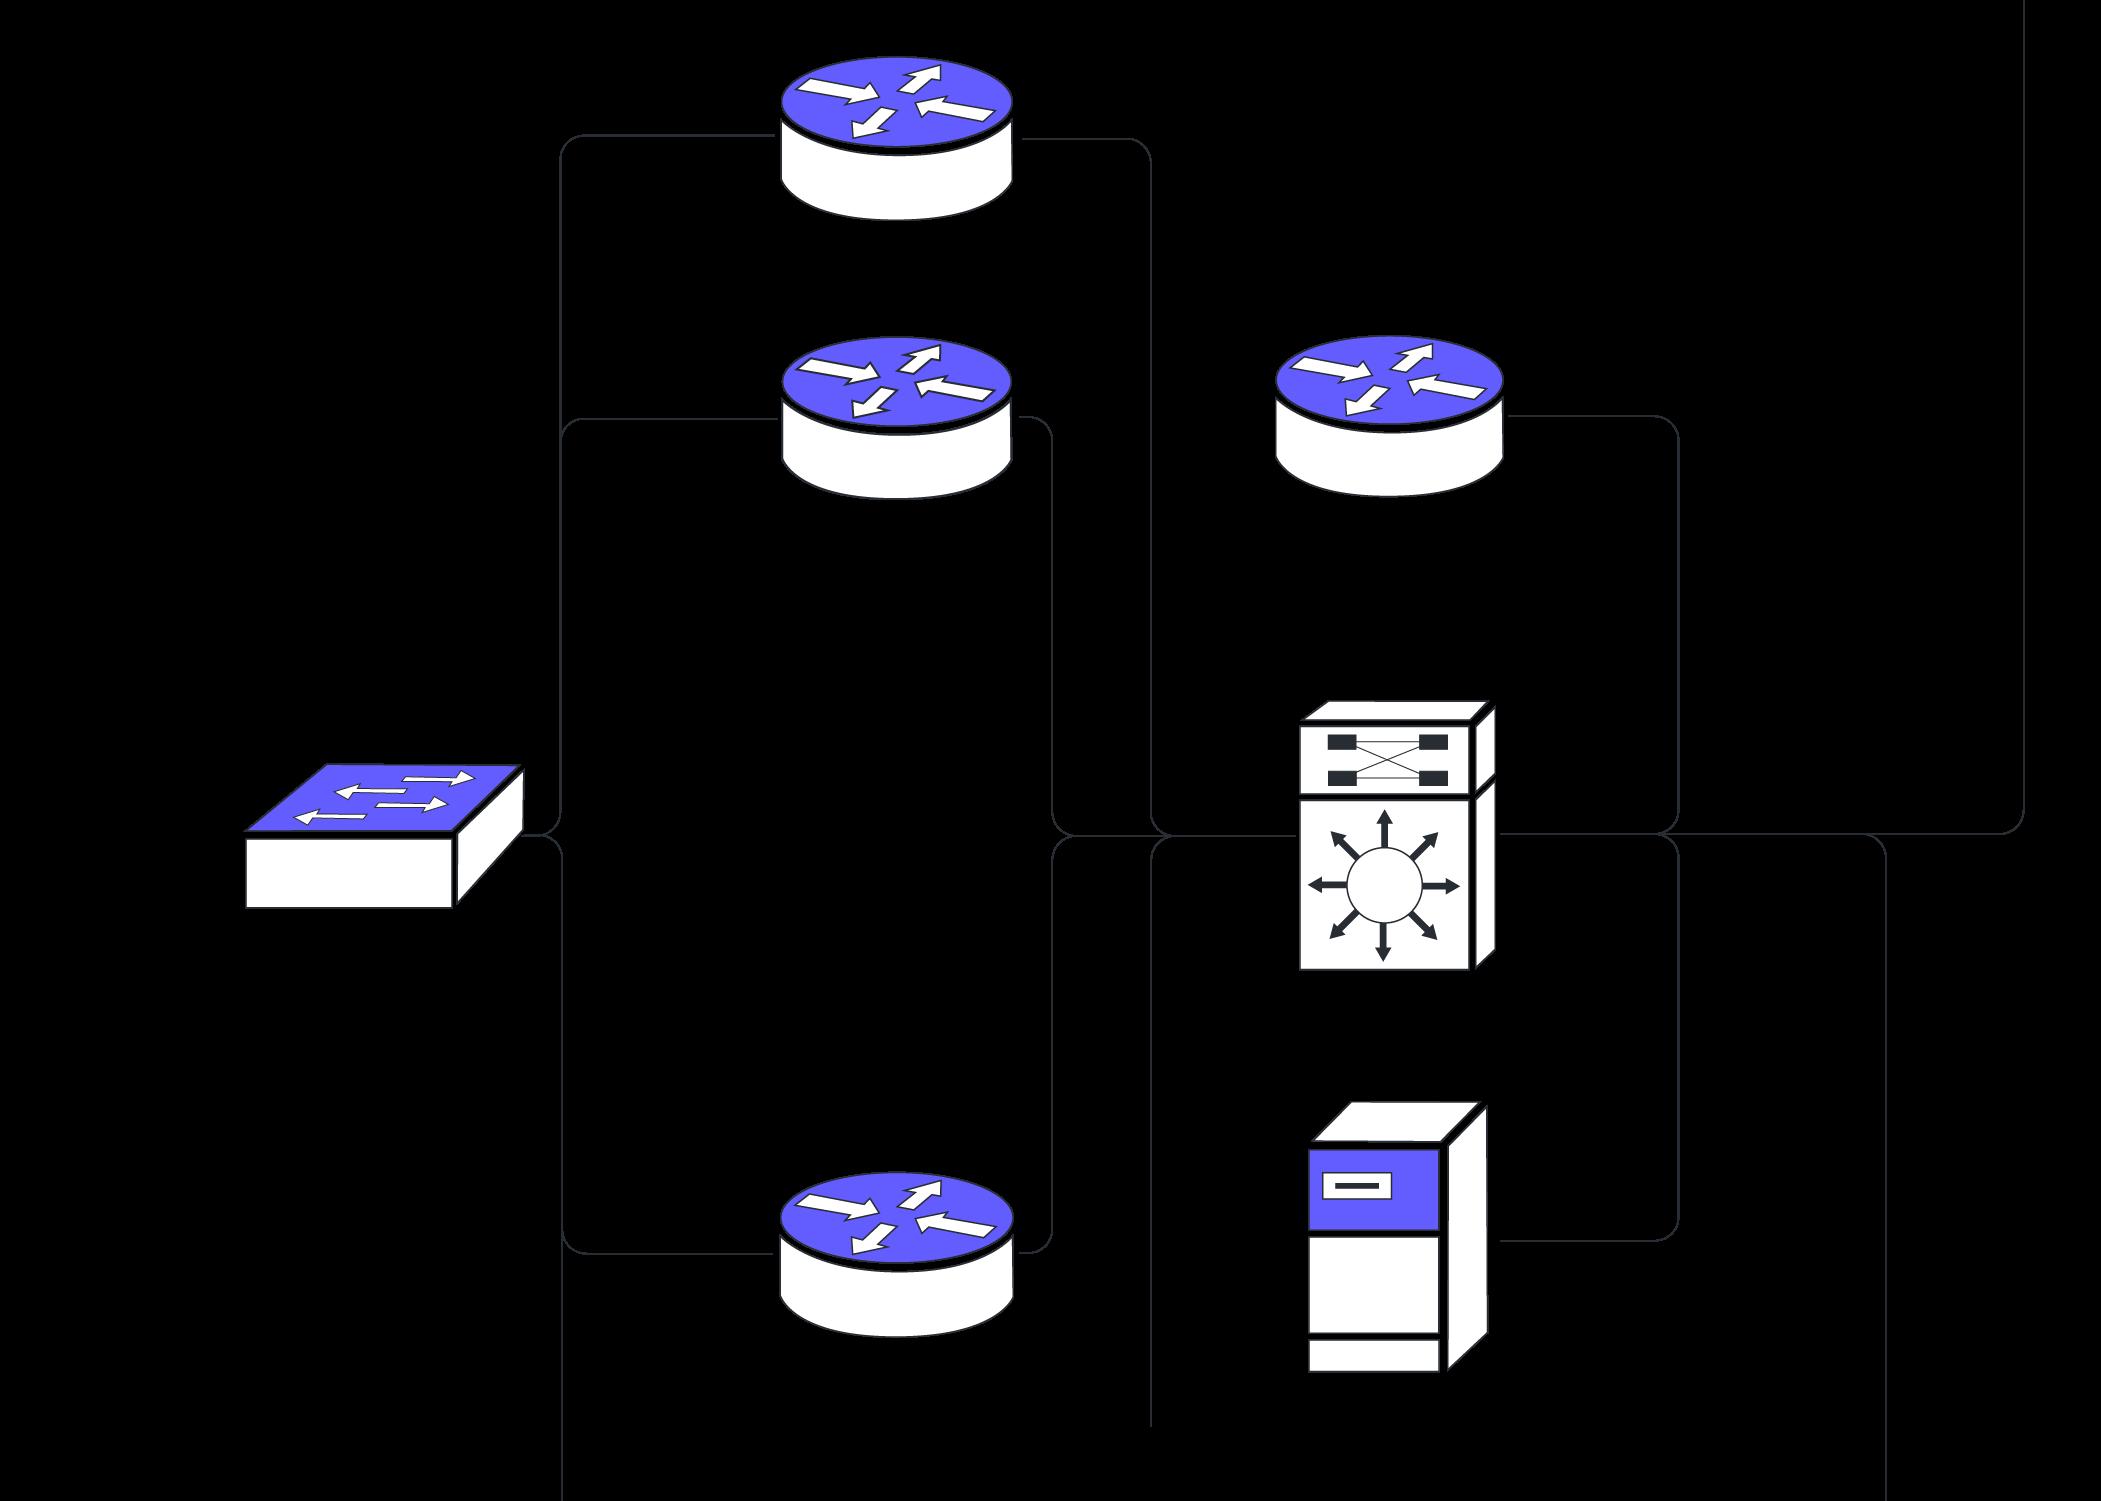 IT プロジェクト管理ツール